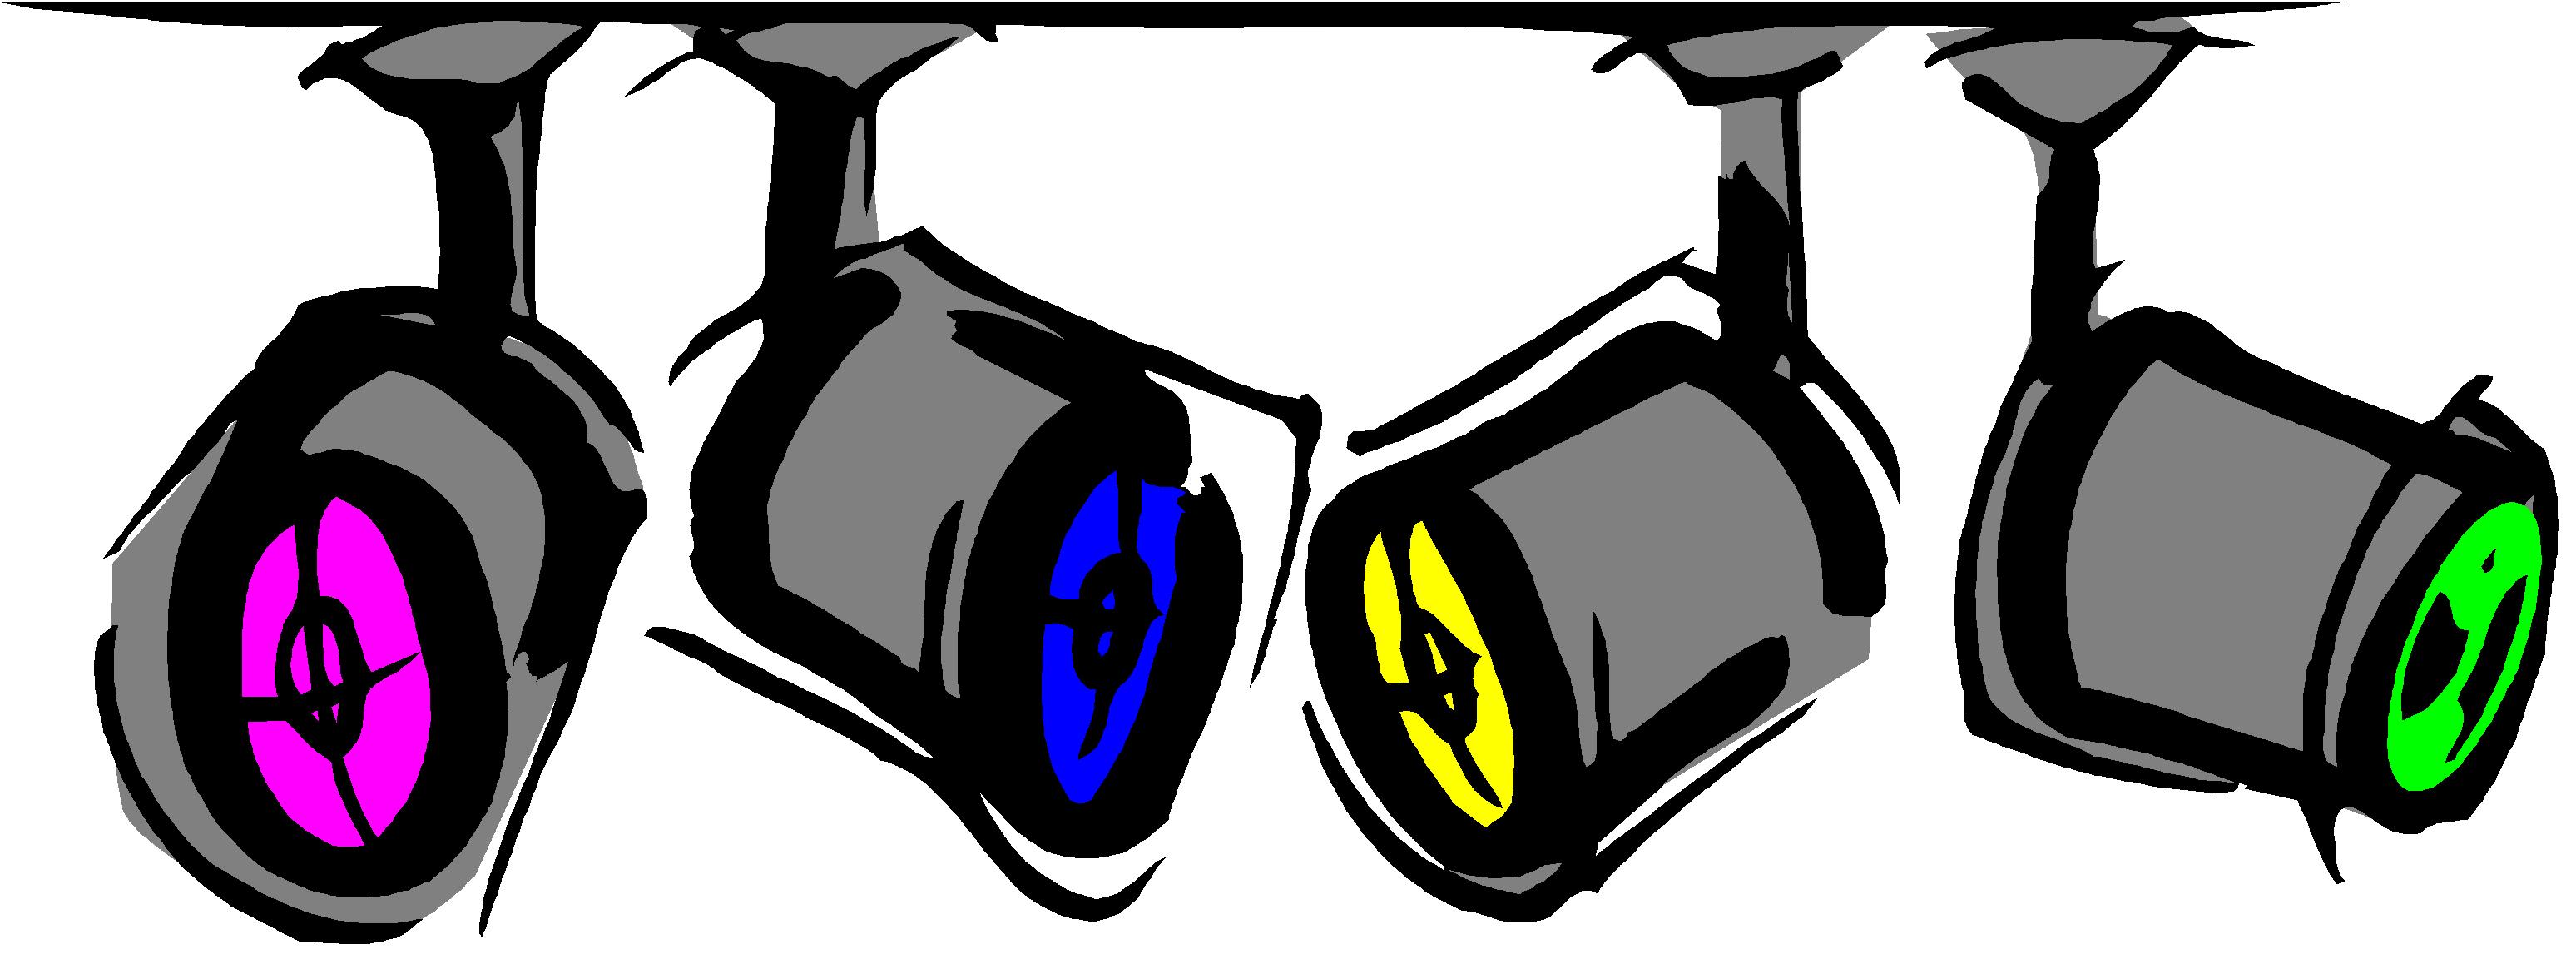 Related Clipart. Spotlight-Related Clipart. Spotlight-4